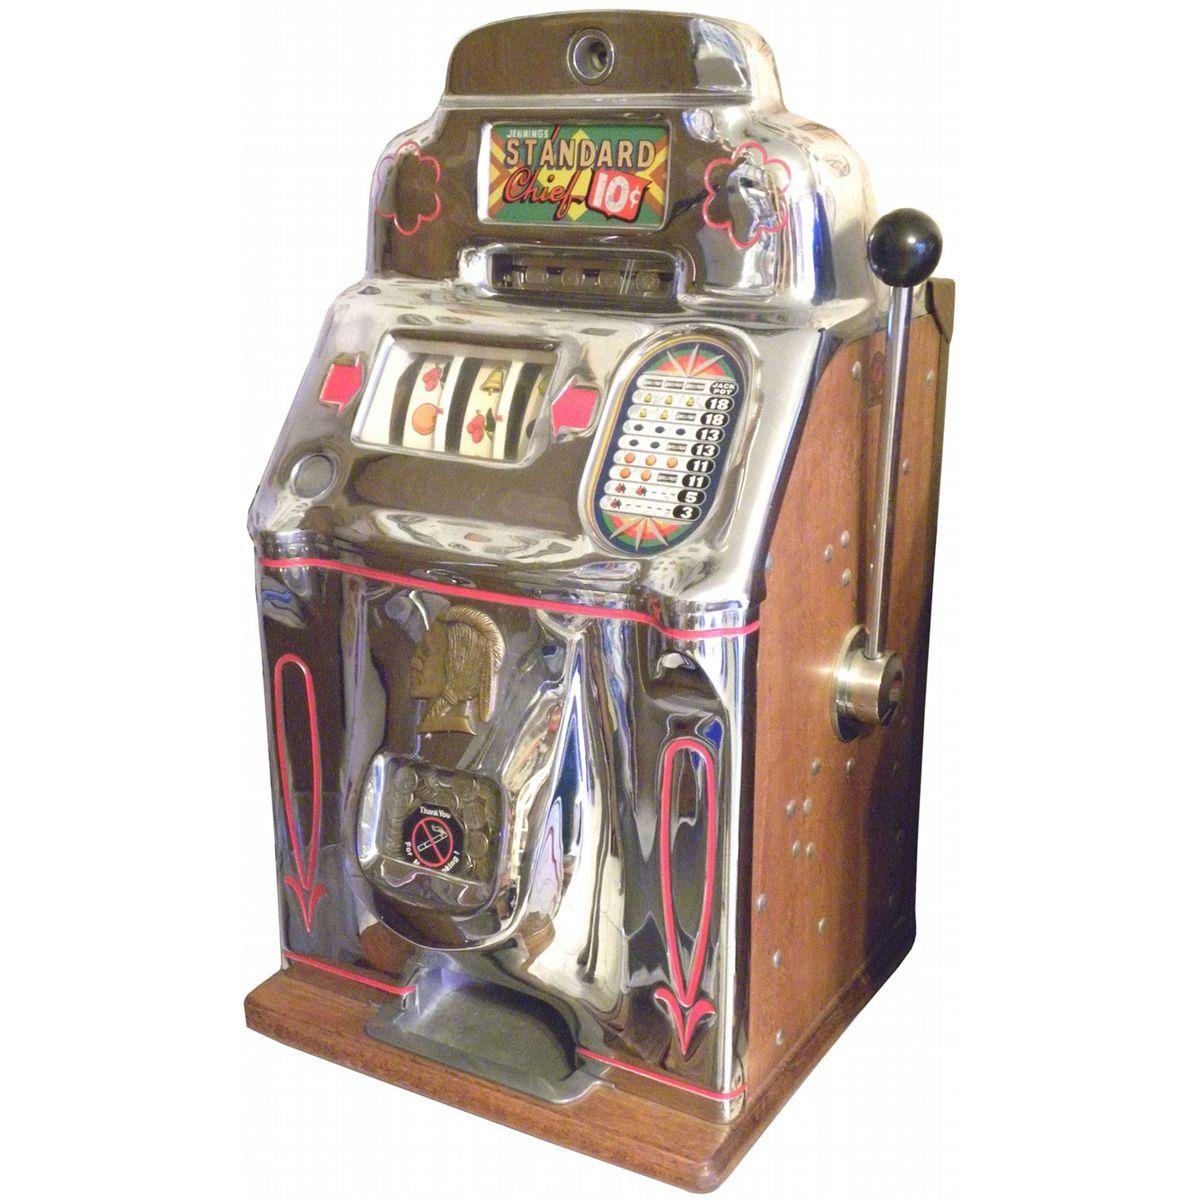 Huge win slots vegas casino